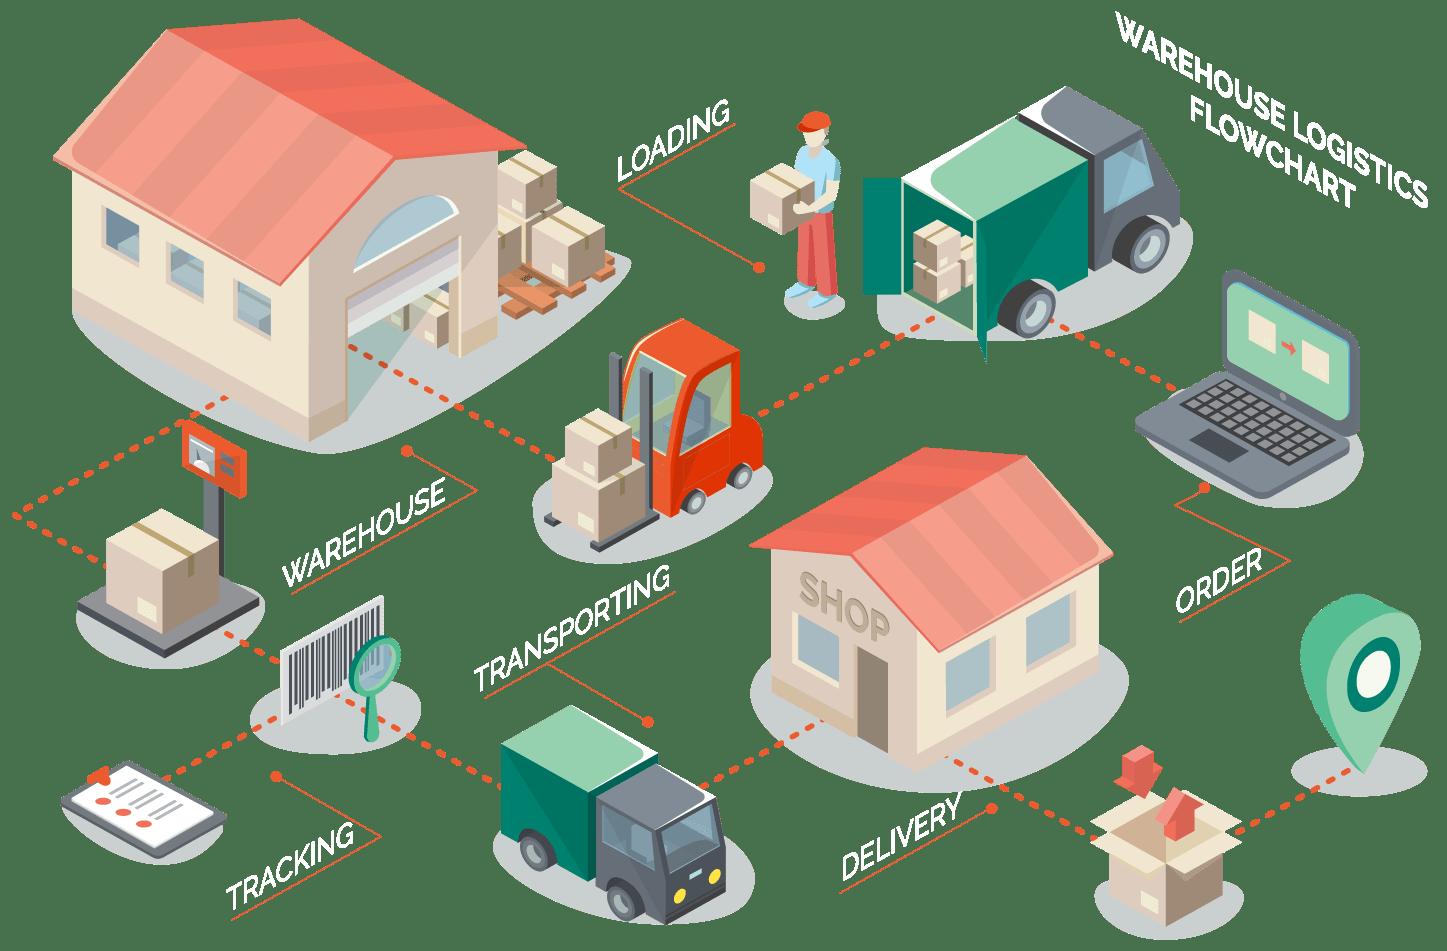 warehouse management system banner image